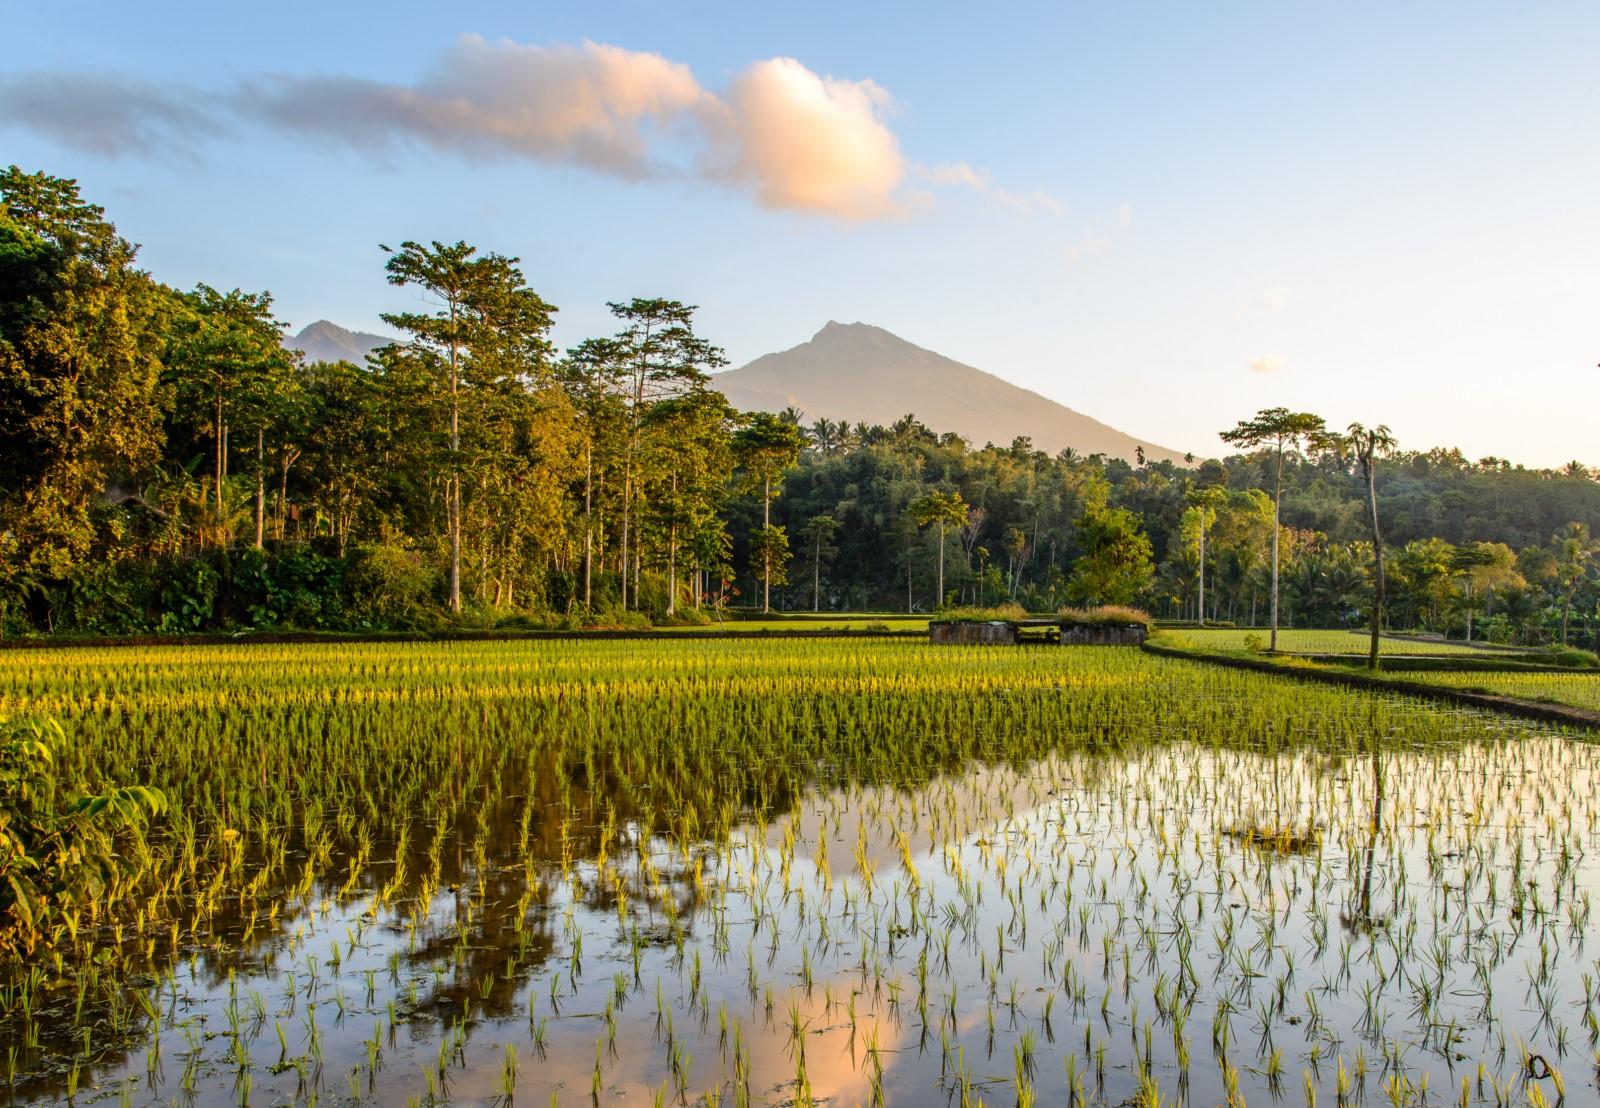 Lombok scenary